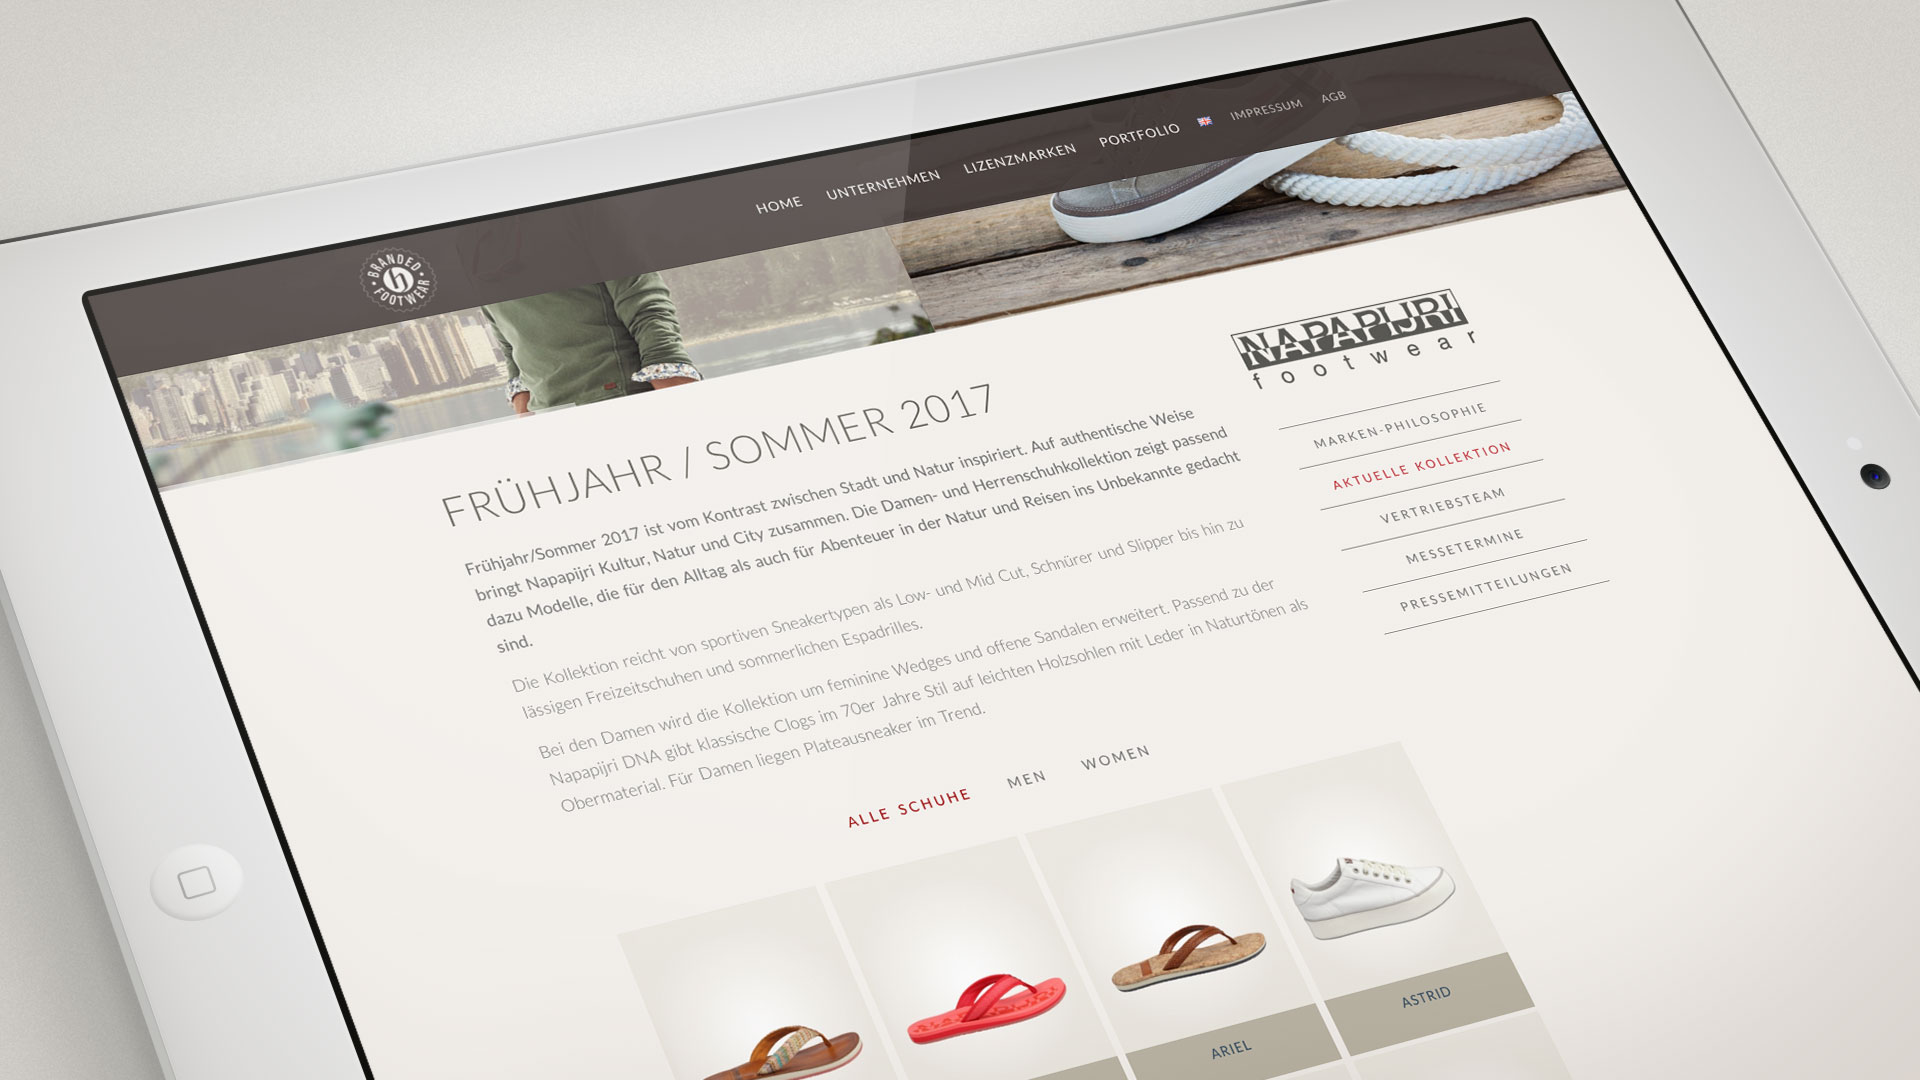 artventura-Projekt Webentwicklung hamm-footwear.com: Kollektionsübersicht der Lizenz-Marke Napapijri footwear